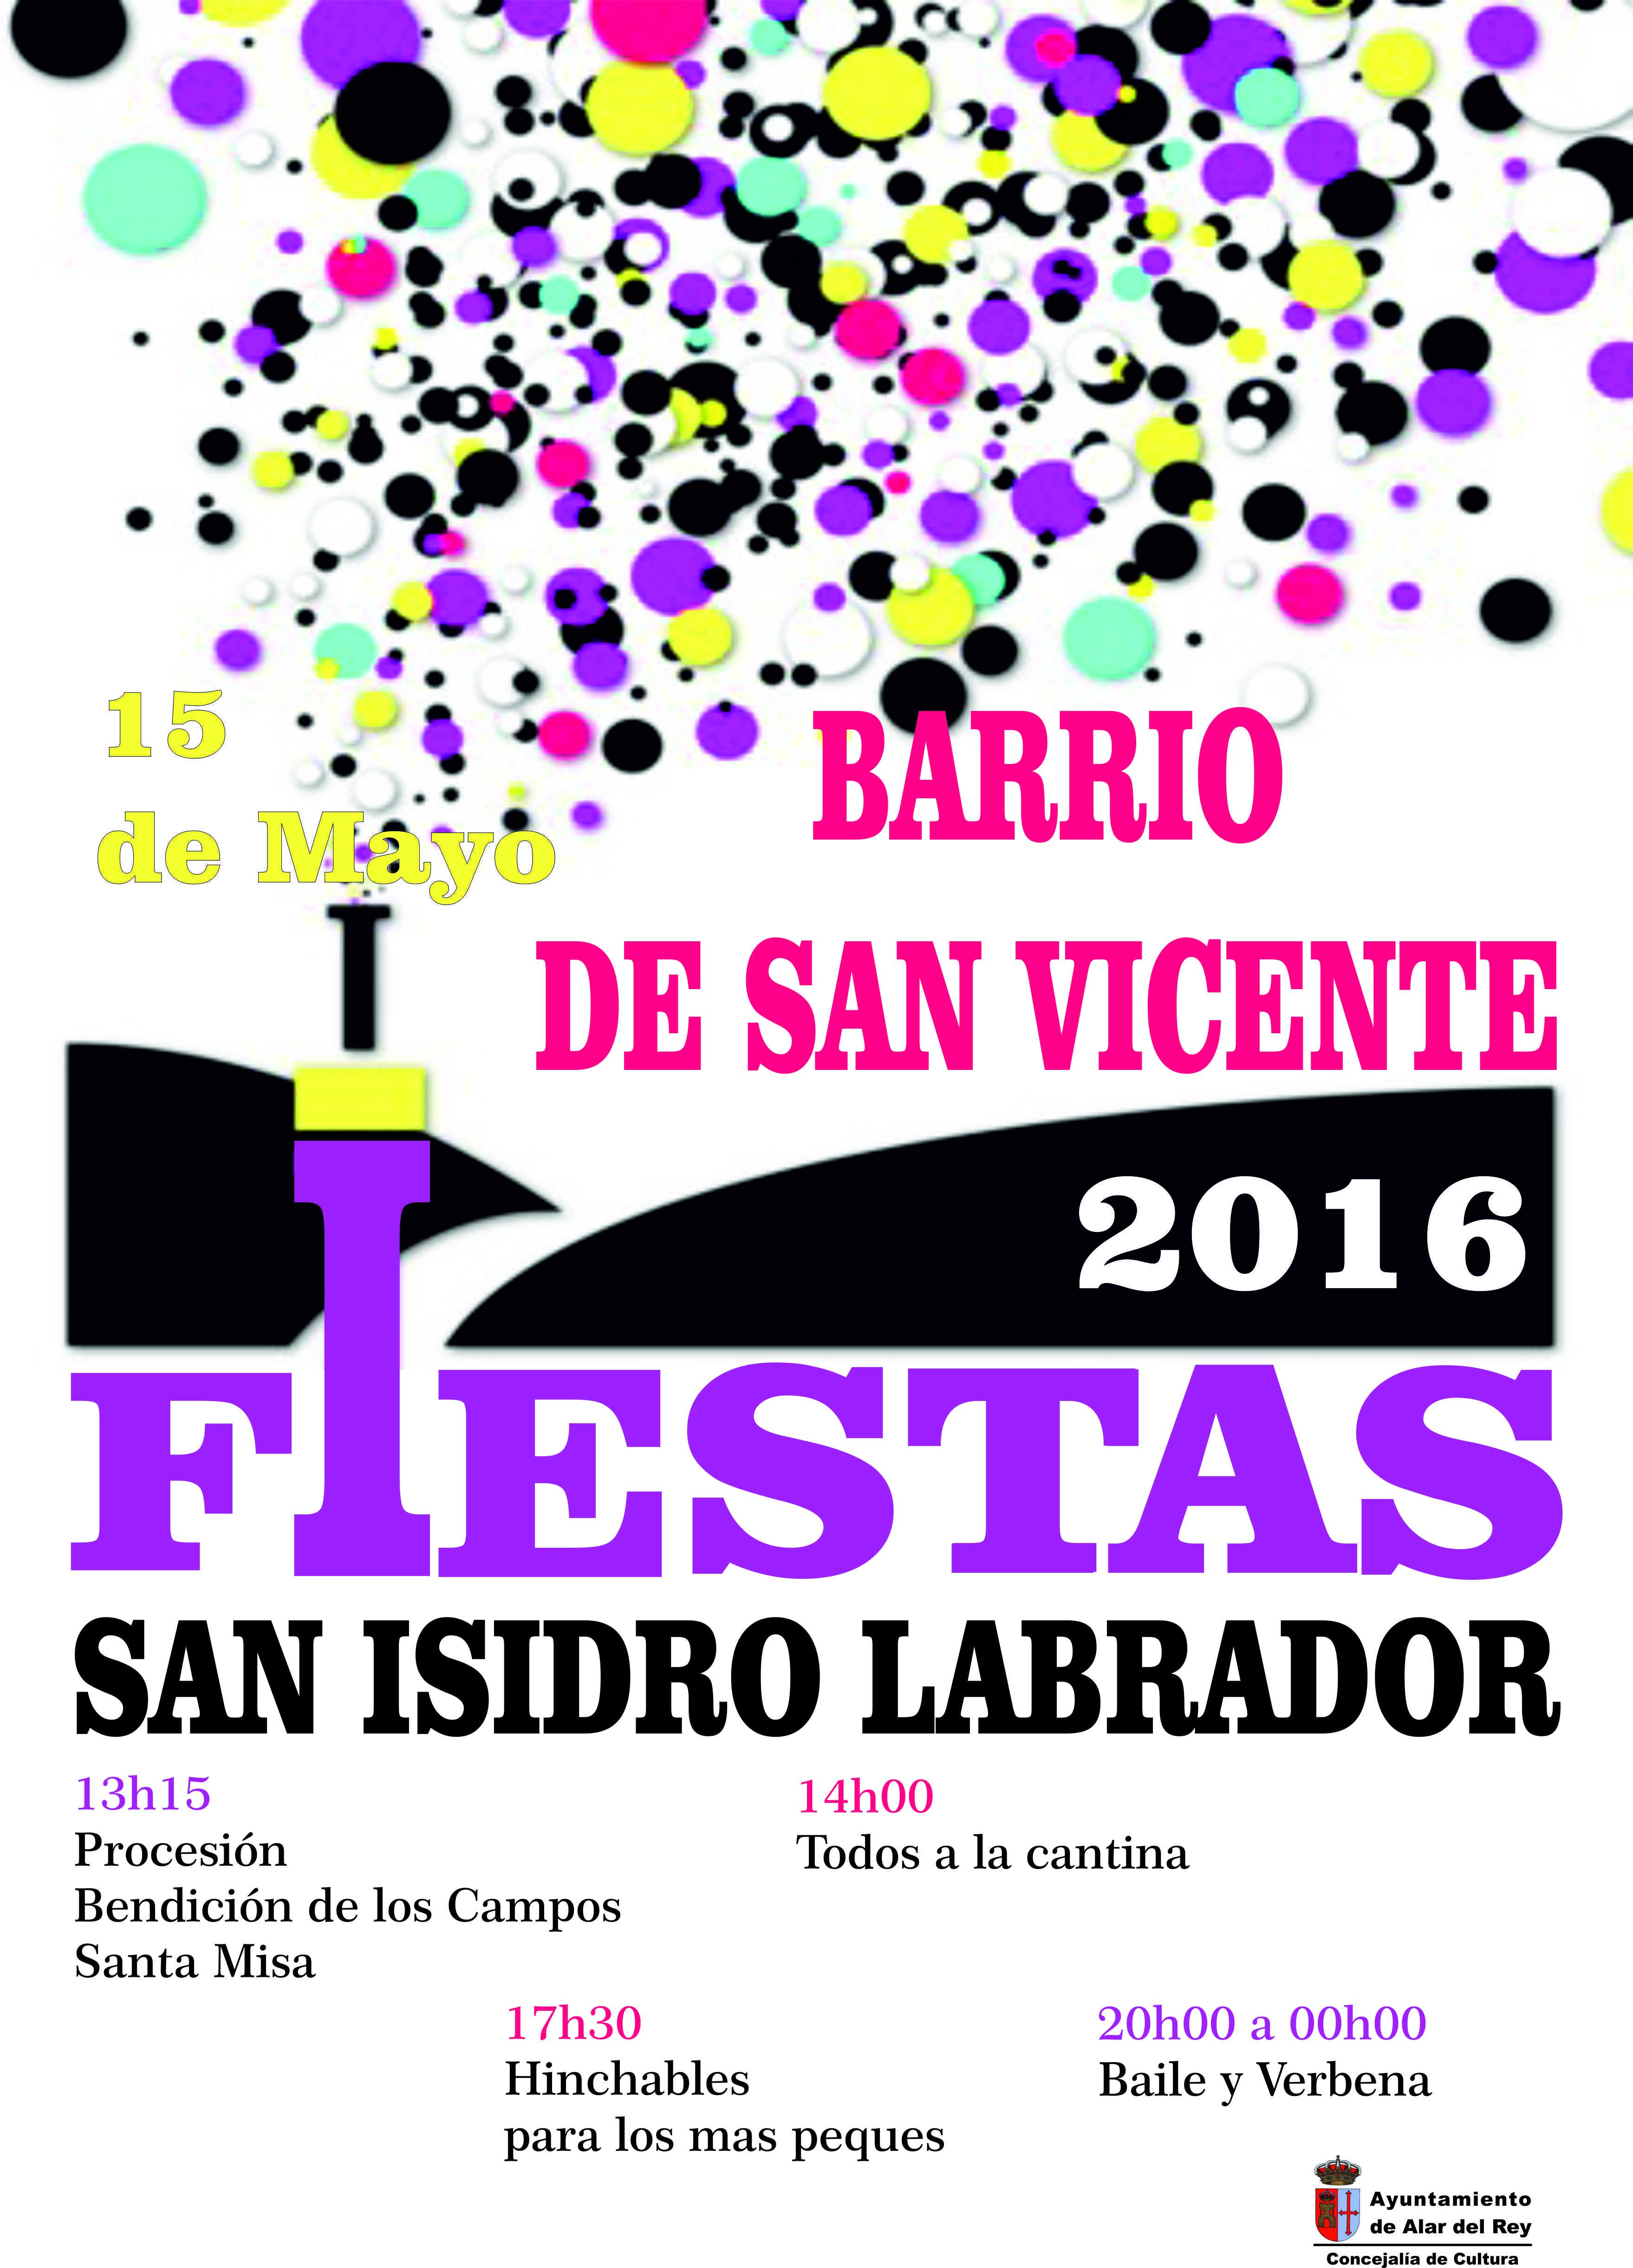 """FIESTAS SAN ISIDRO 2016""  BARRIO DE SAN VICENTE"